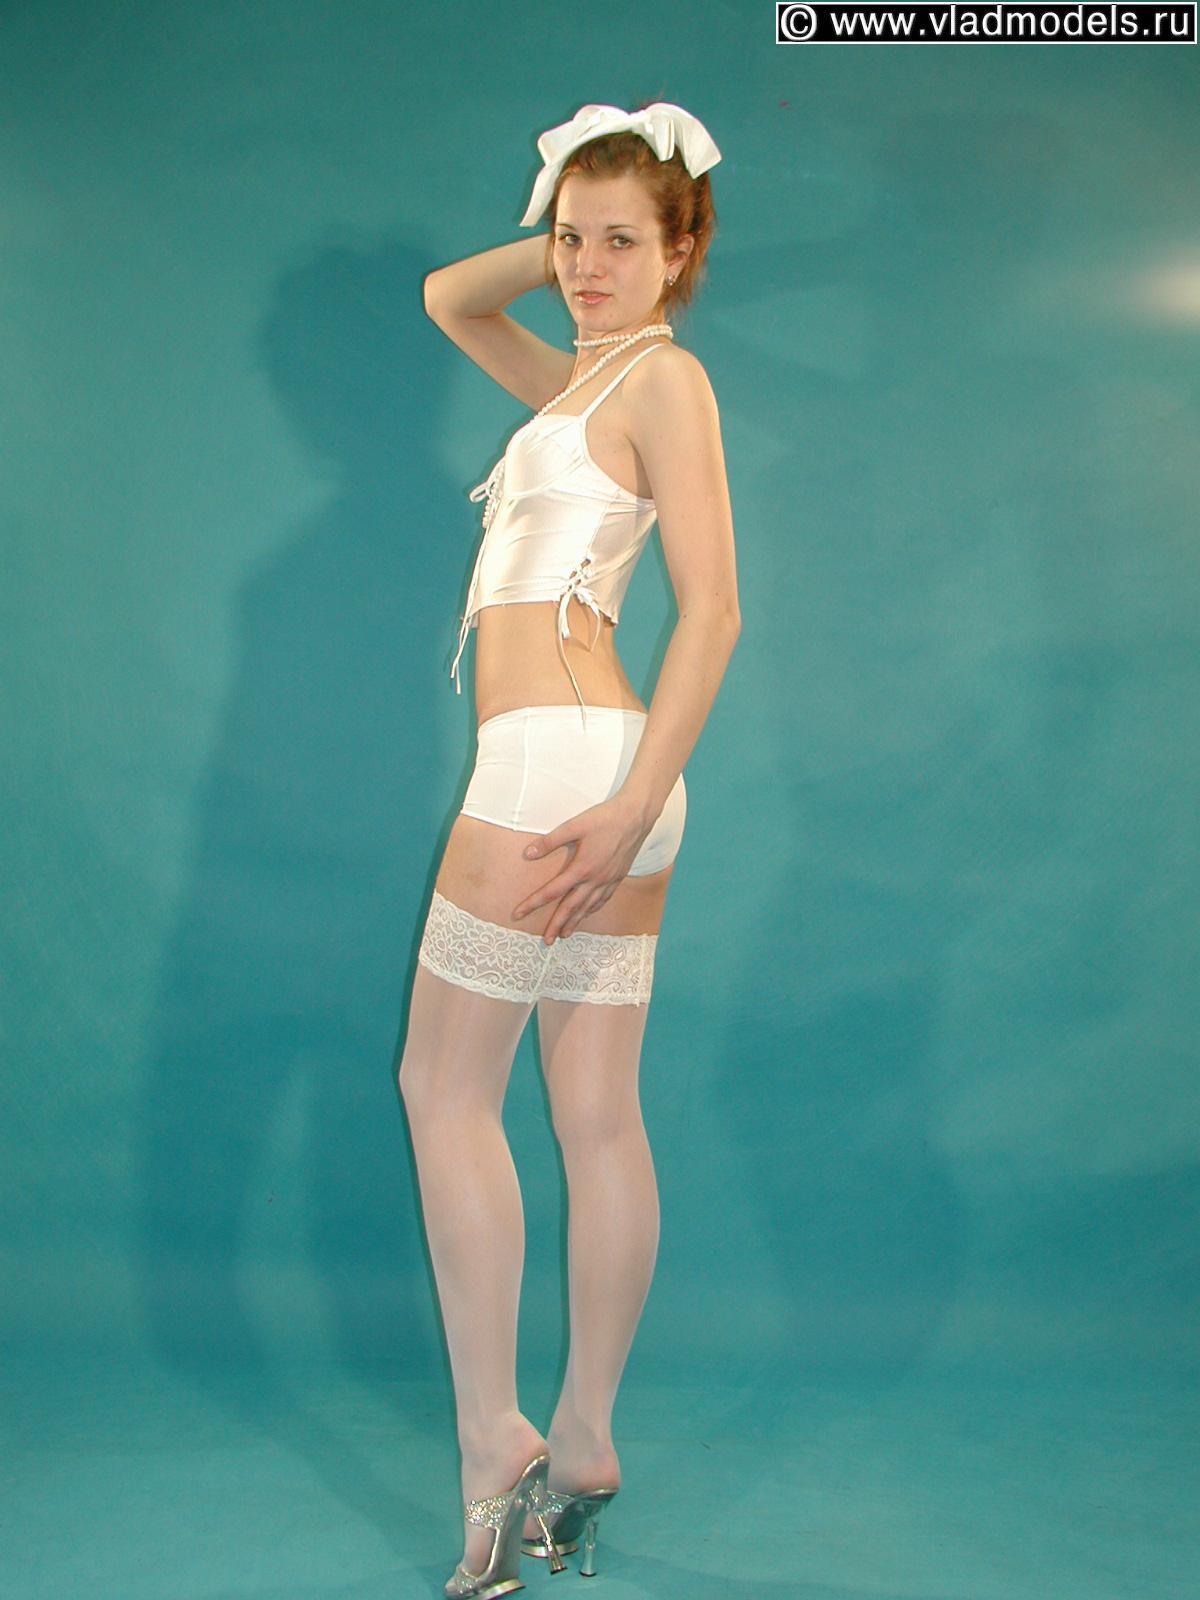 Teen Young Vlad Model Pantyhose